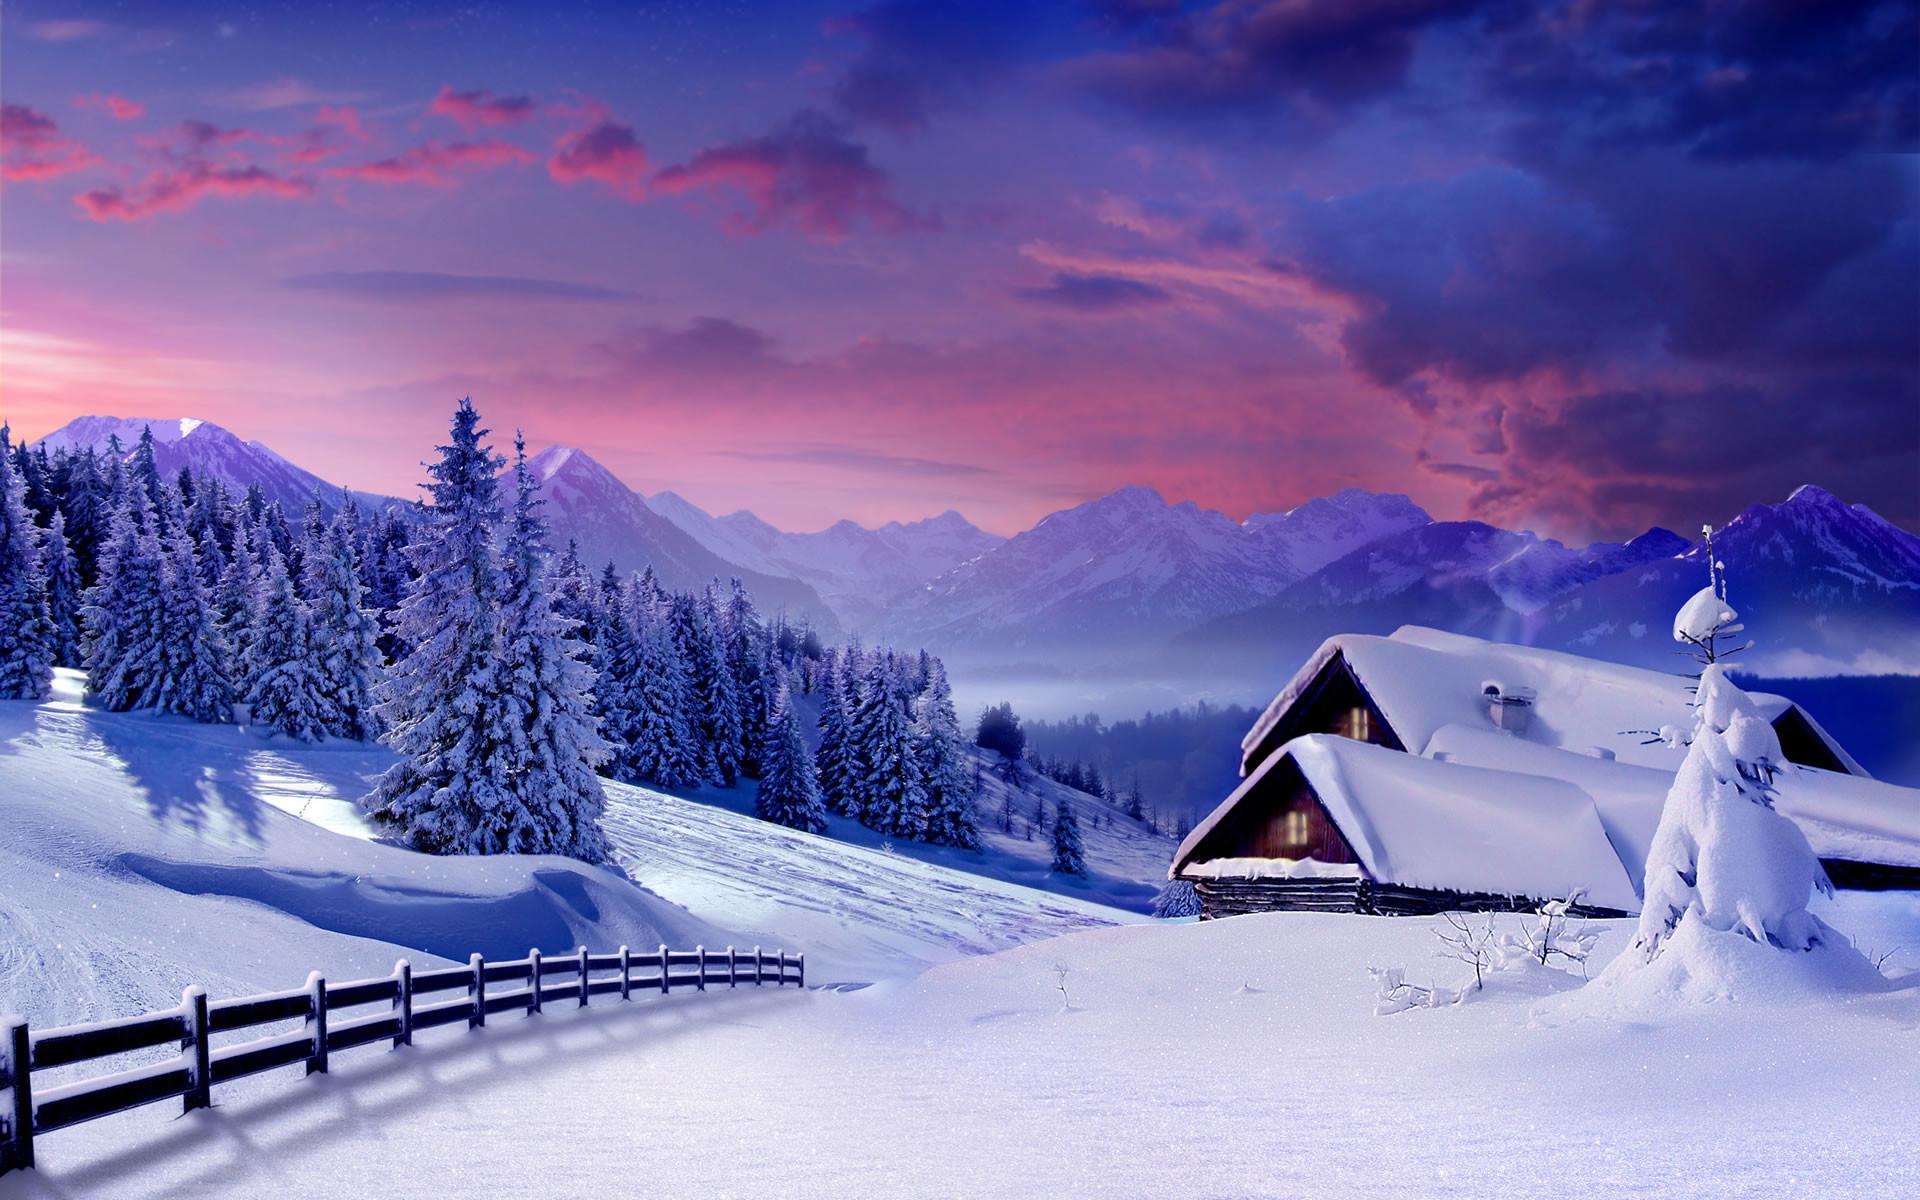 Winter Wallpaper 17